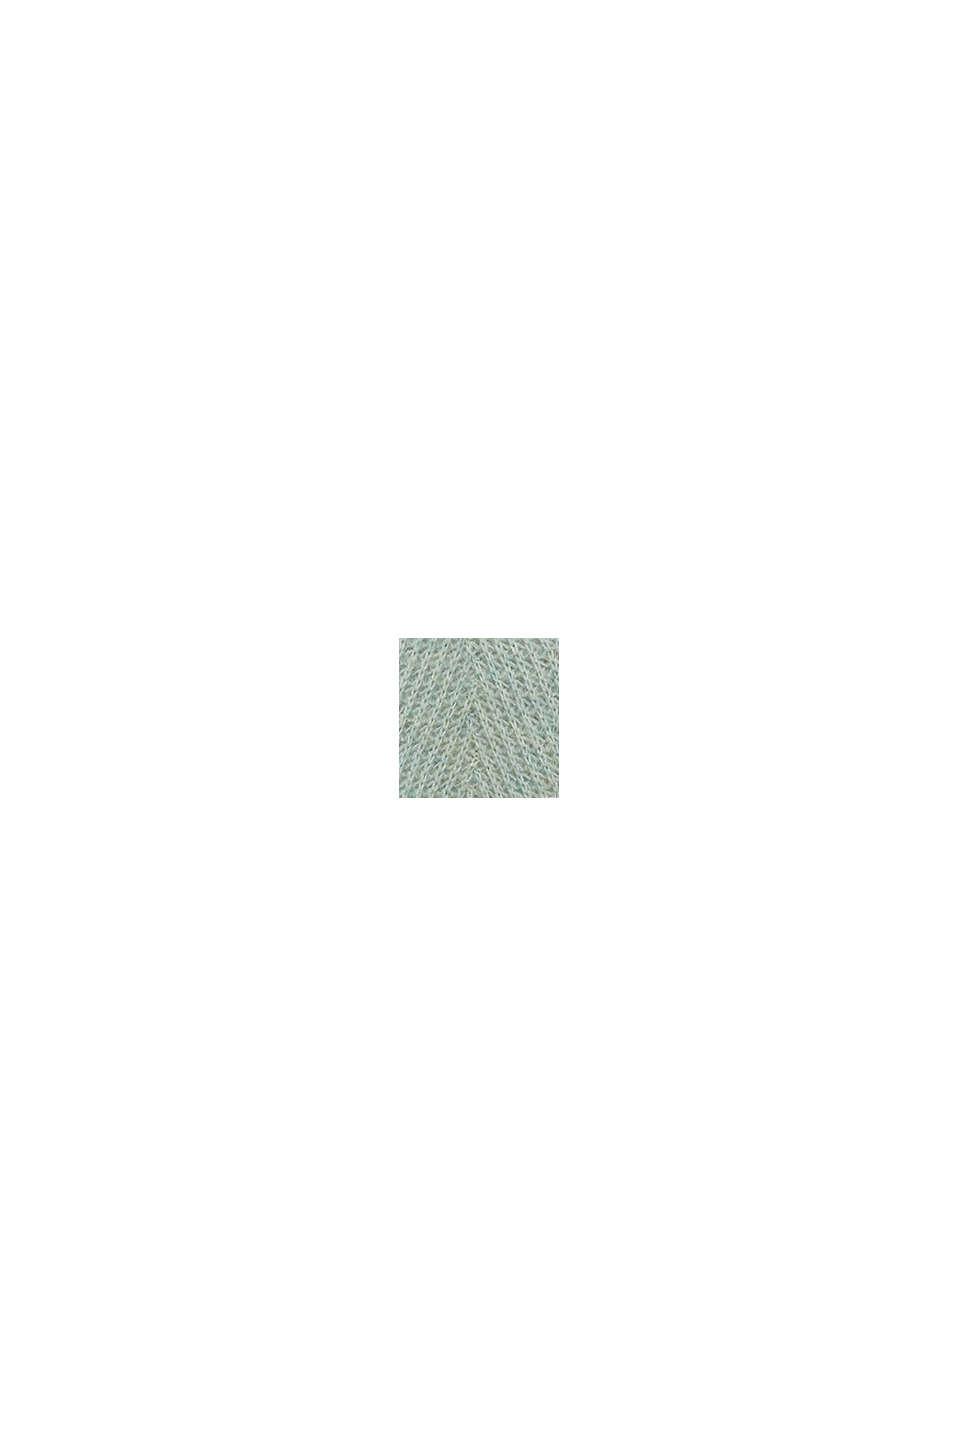 In misto lana: pullover strutturato, PASTEL GREEN, swatch